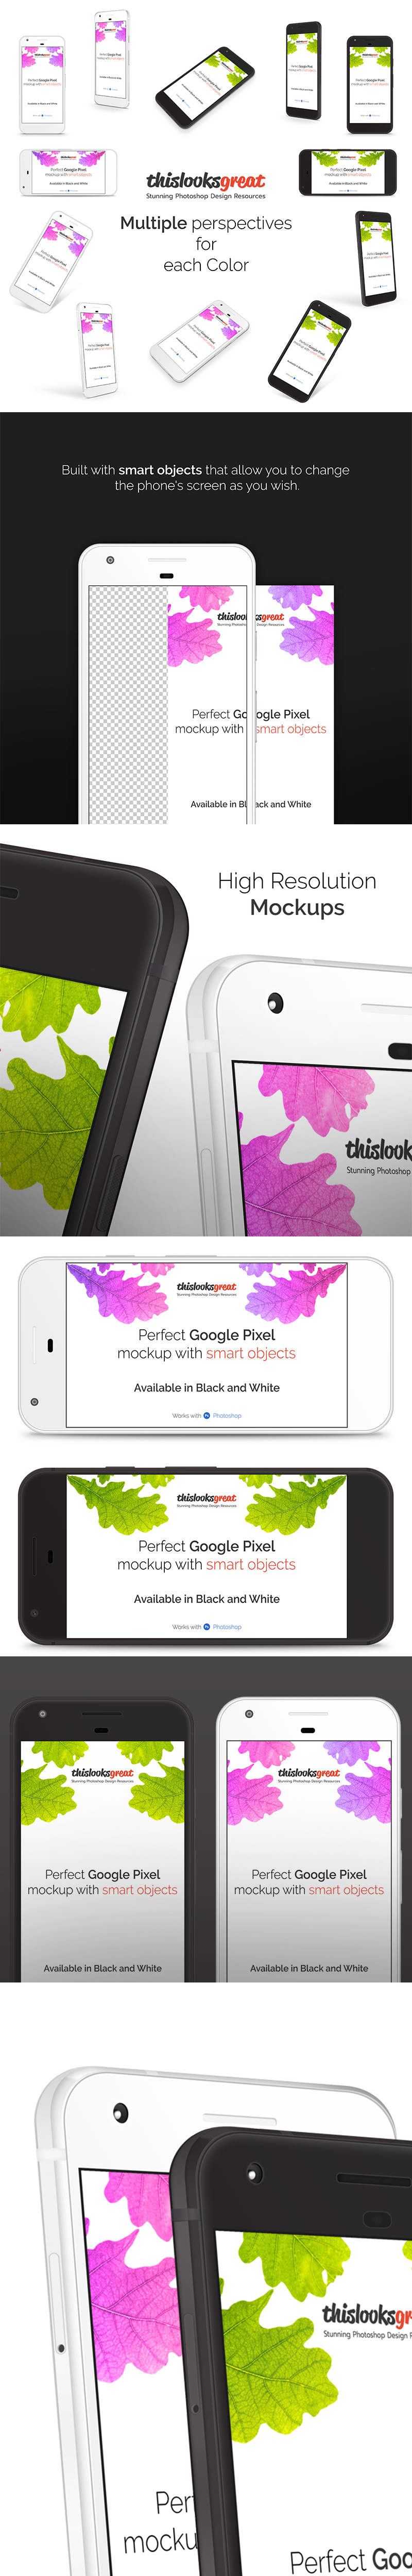 Google Pixel Phone Mockup